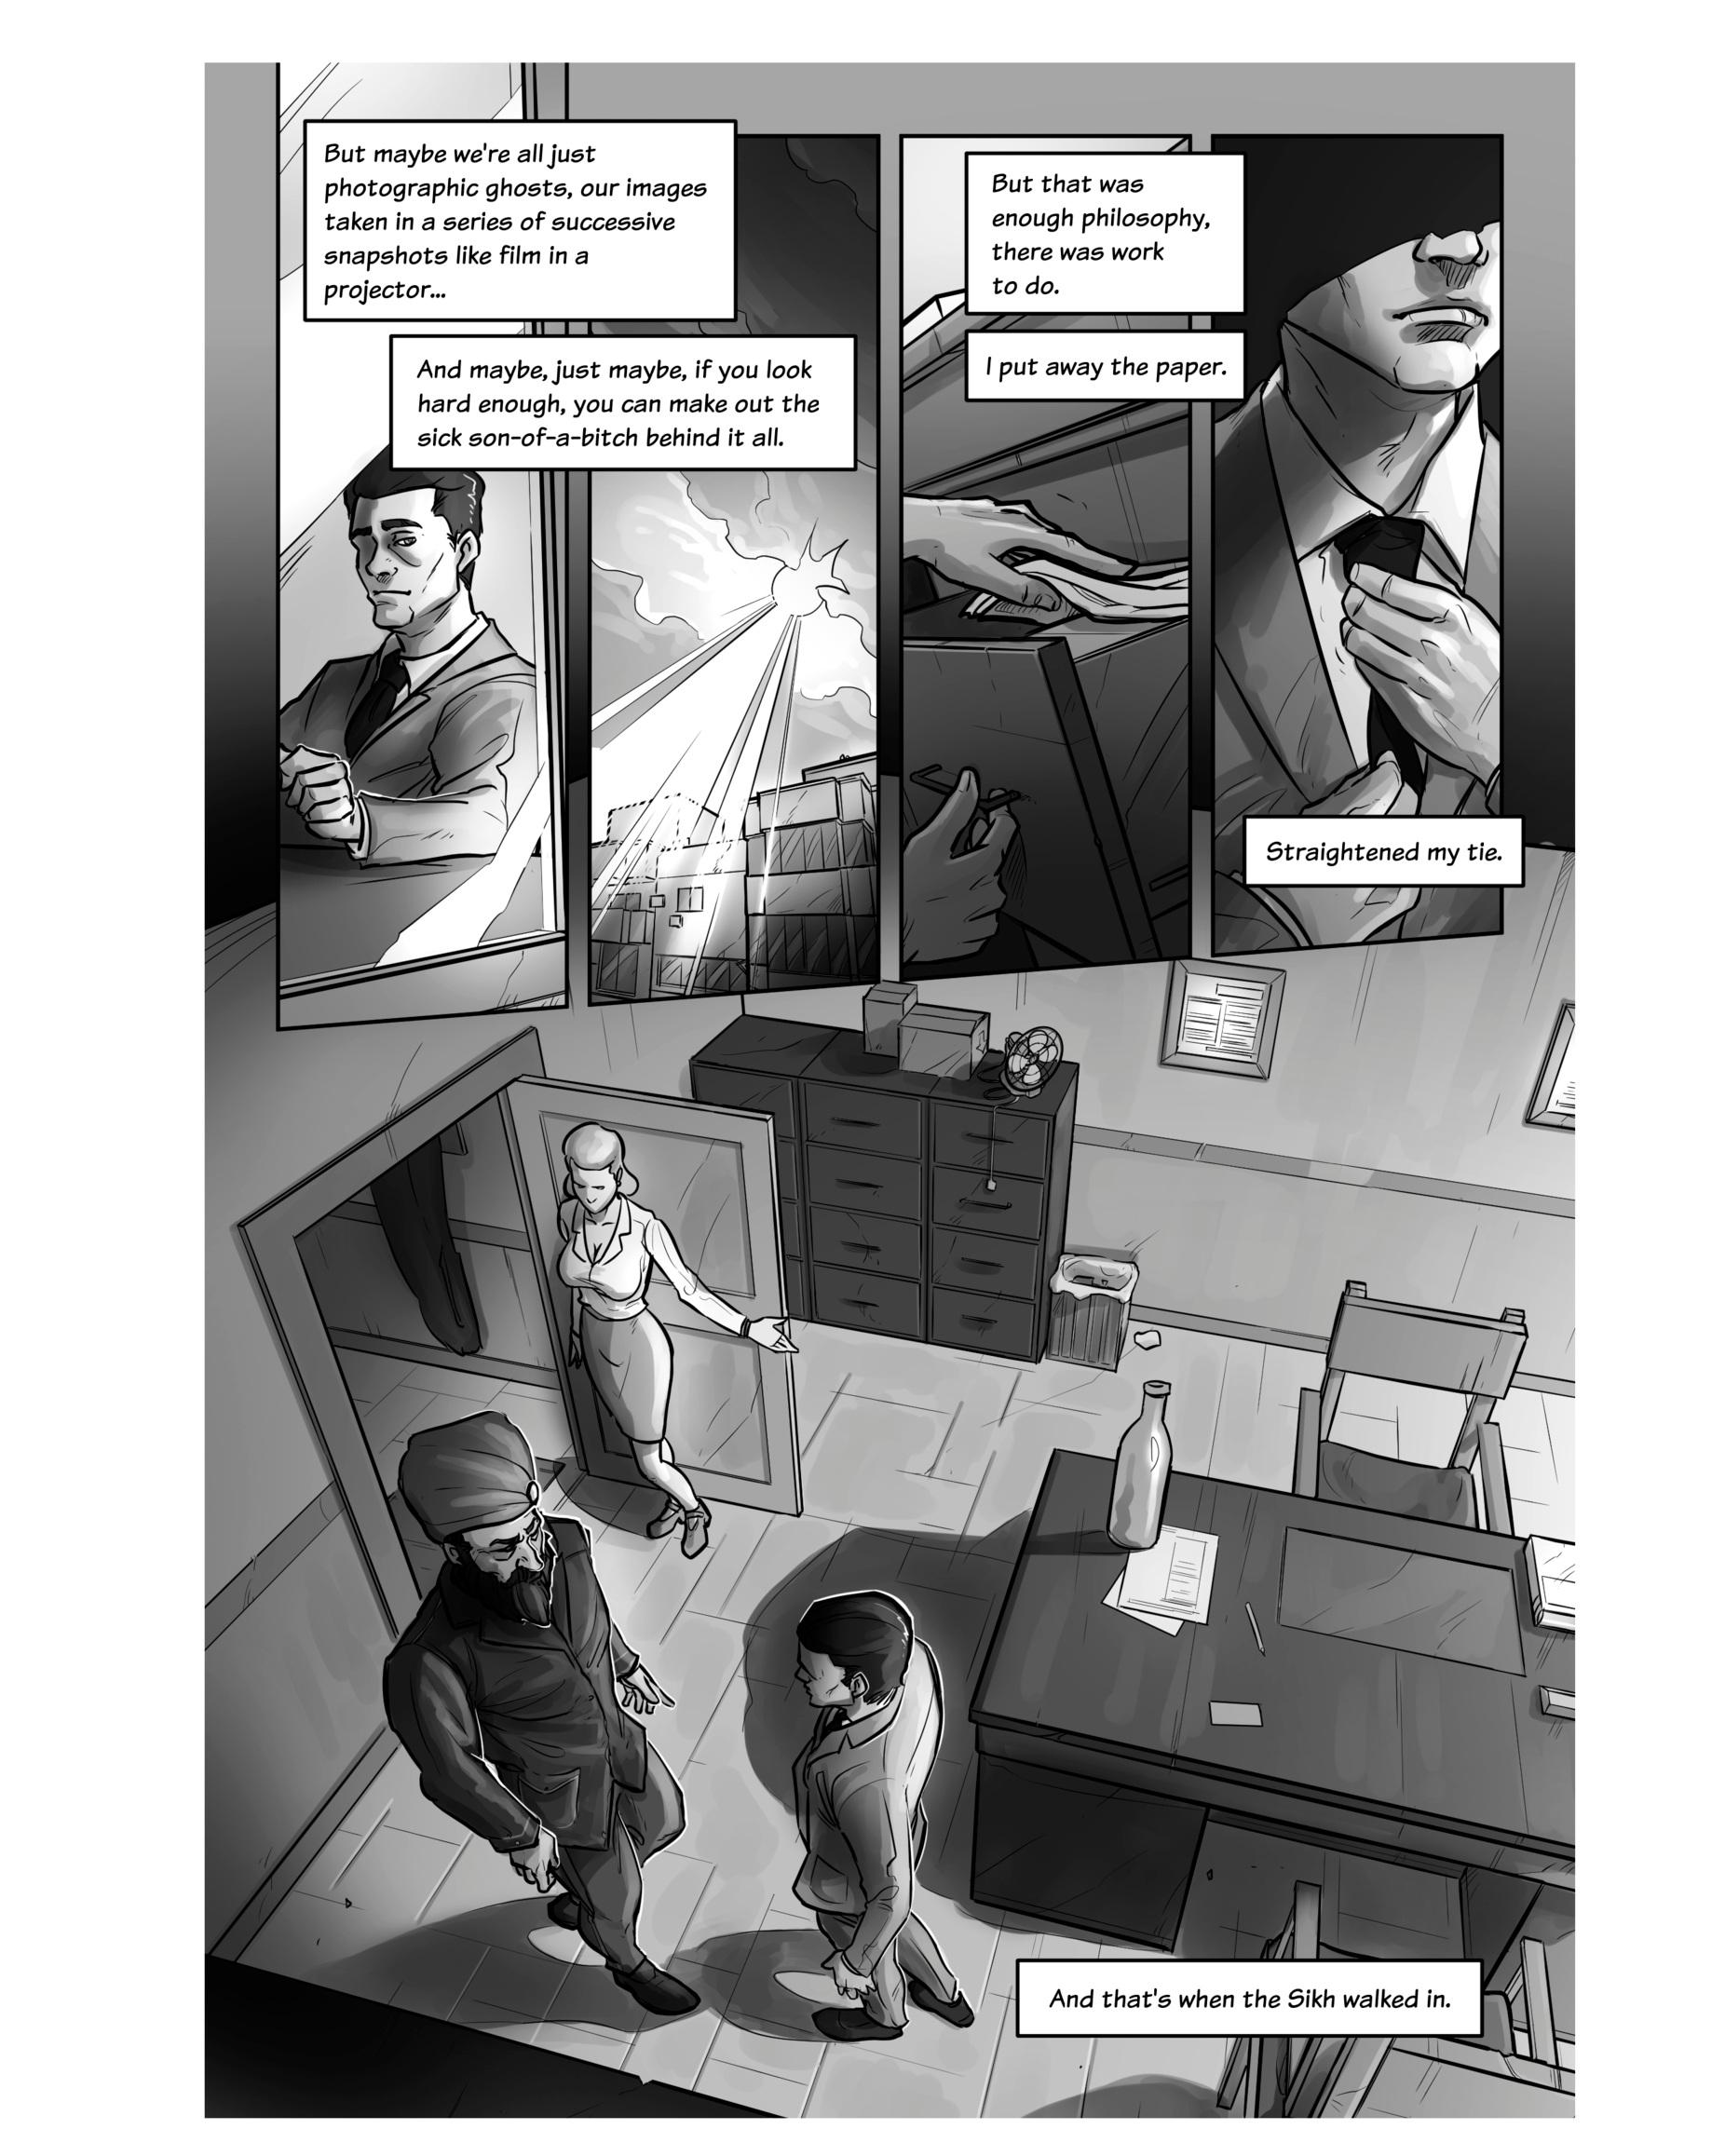 owatw_1+PAGE+22+WEB.jpg